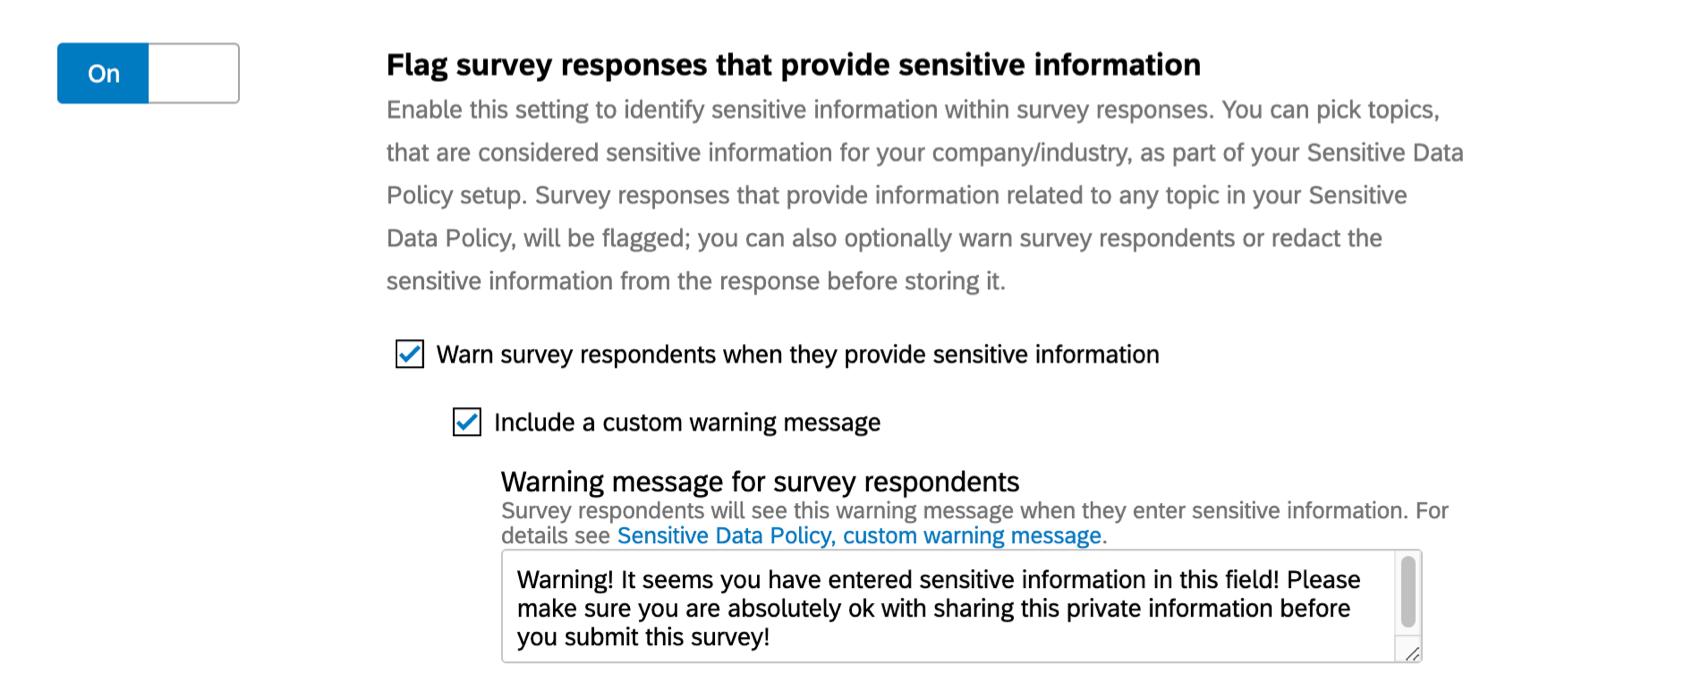 Flag survey responses option